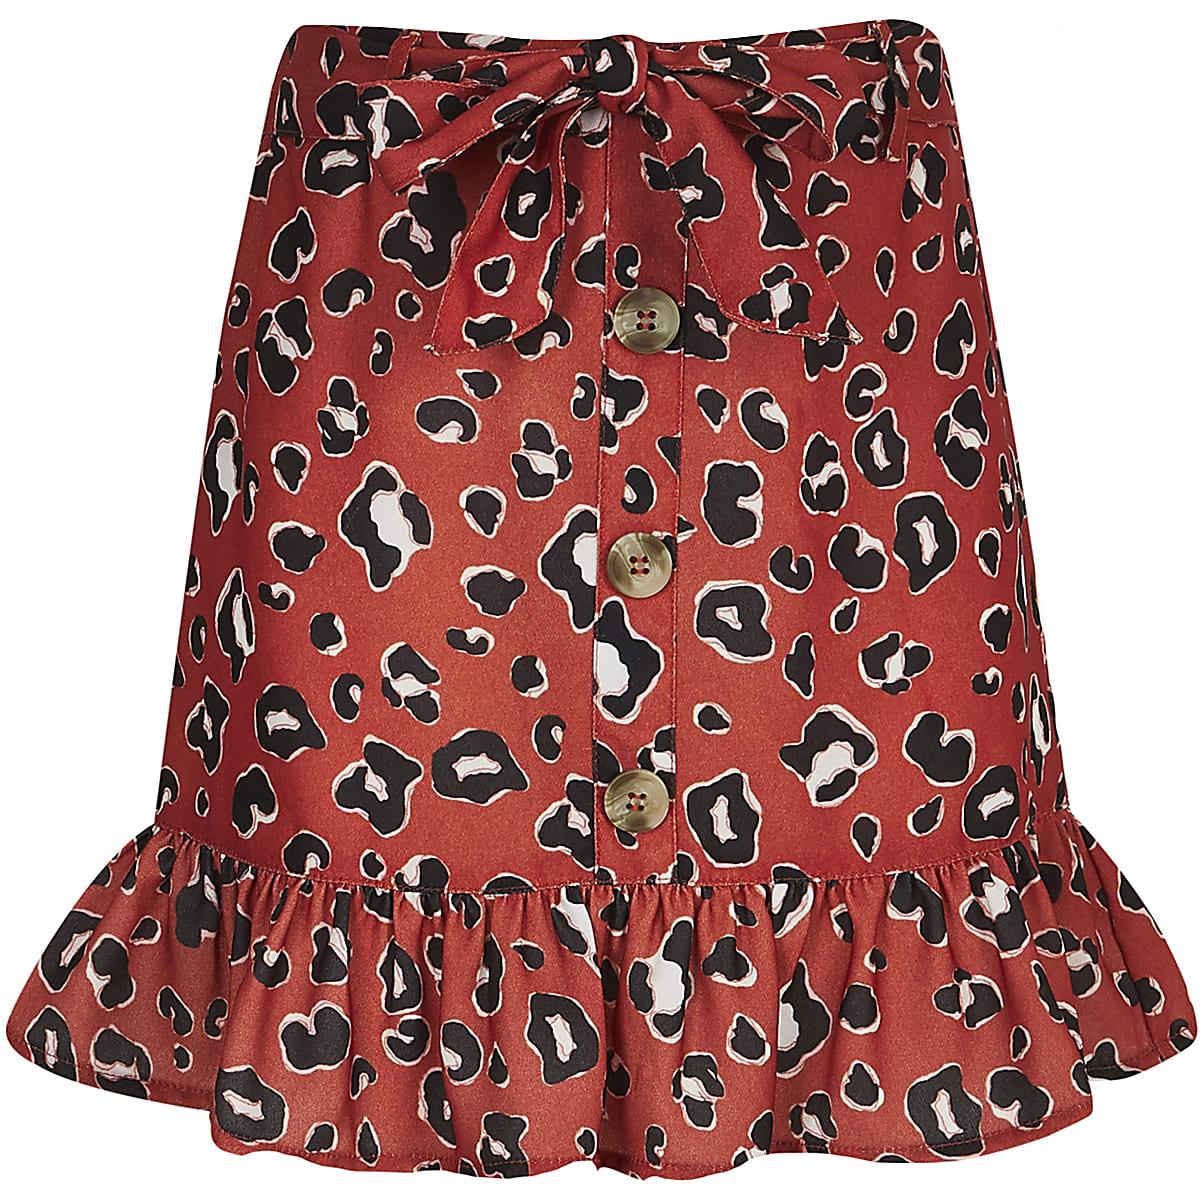 Girls red leopard print frill skirt